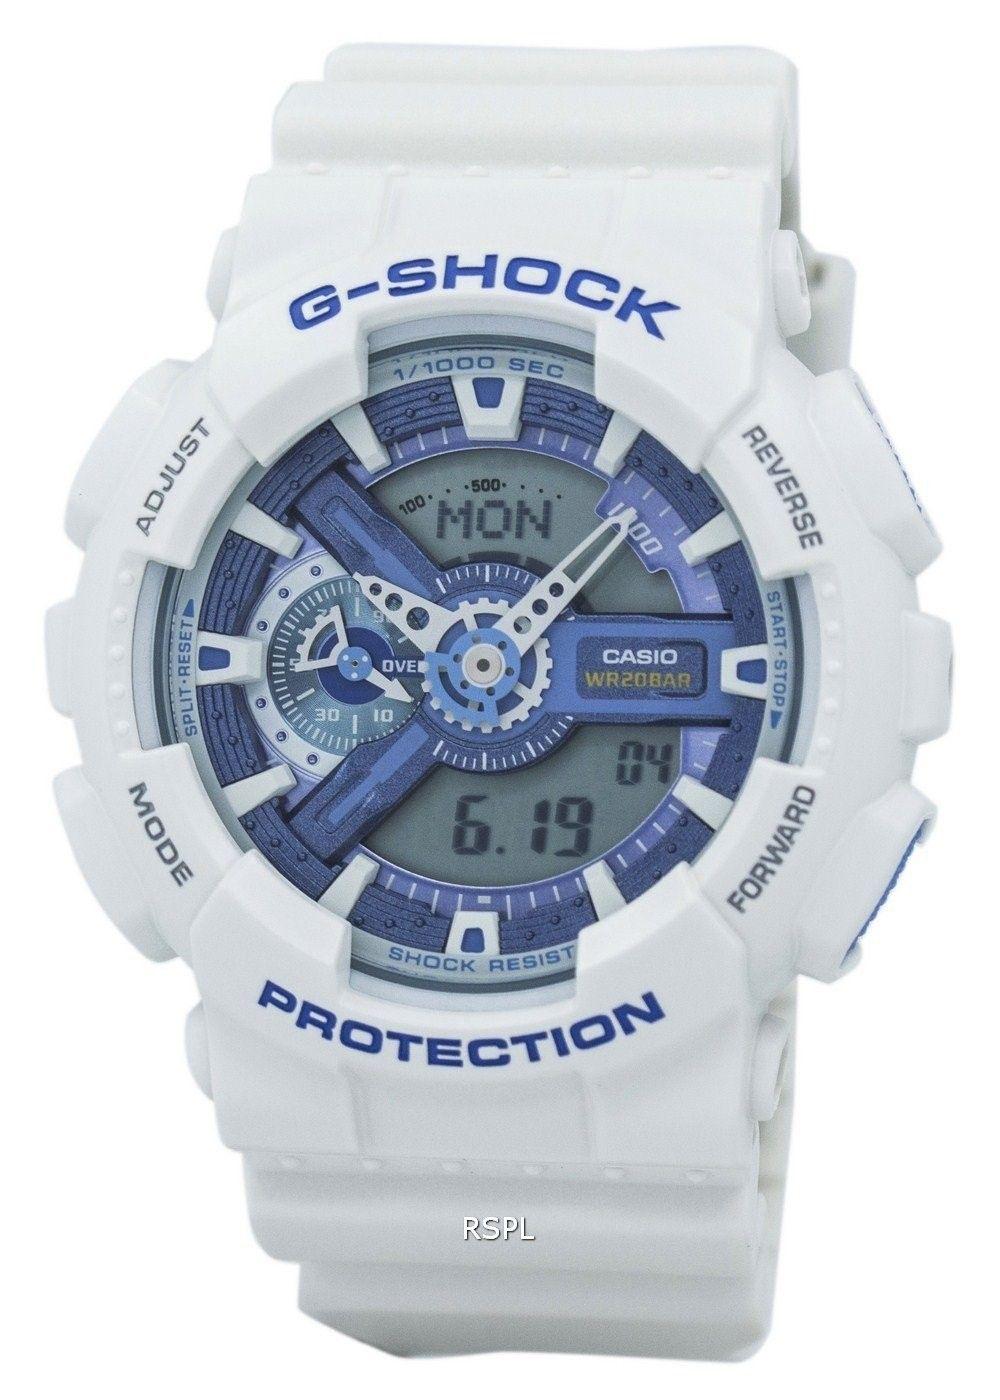 e381fdfed Casio G-Shock Analog Digital 200M GA-110WB-7A Men's Watch   Casio G ...